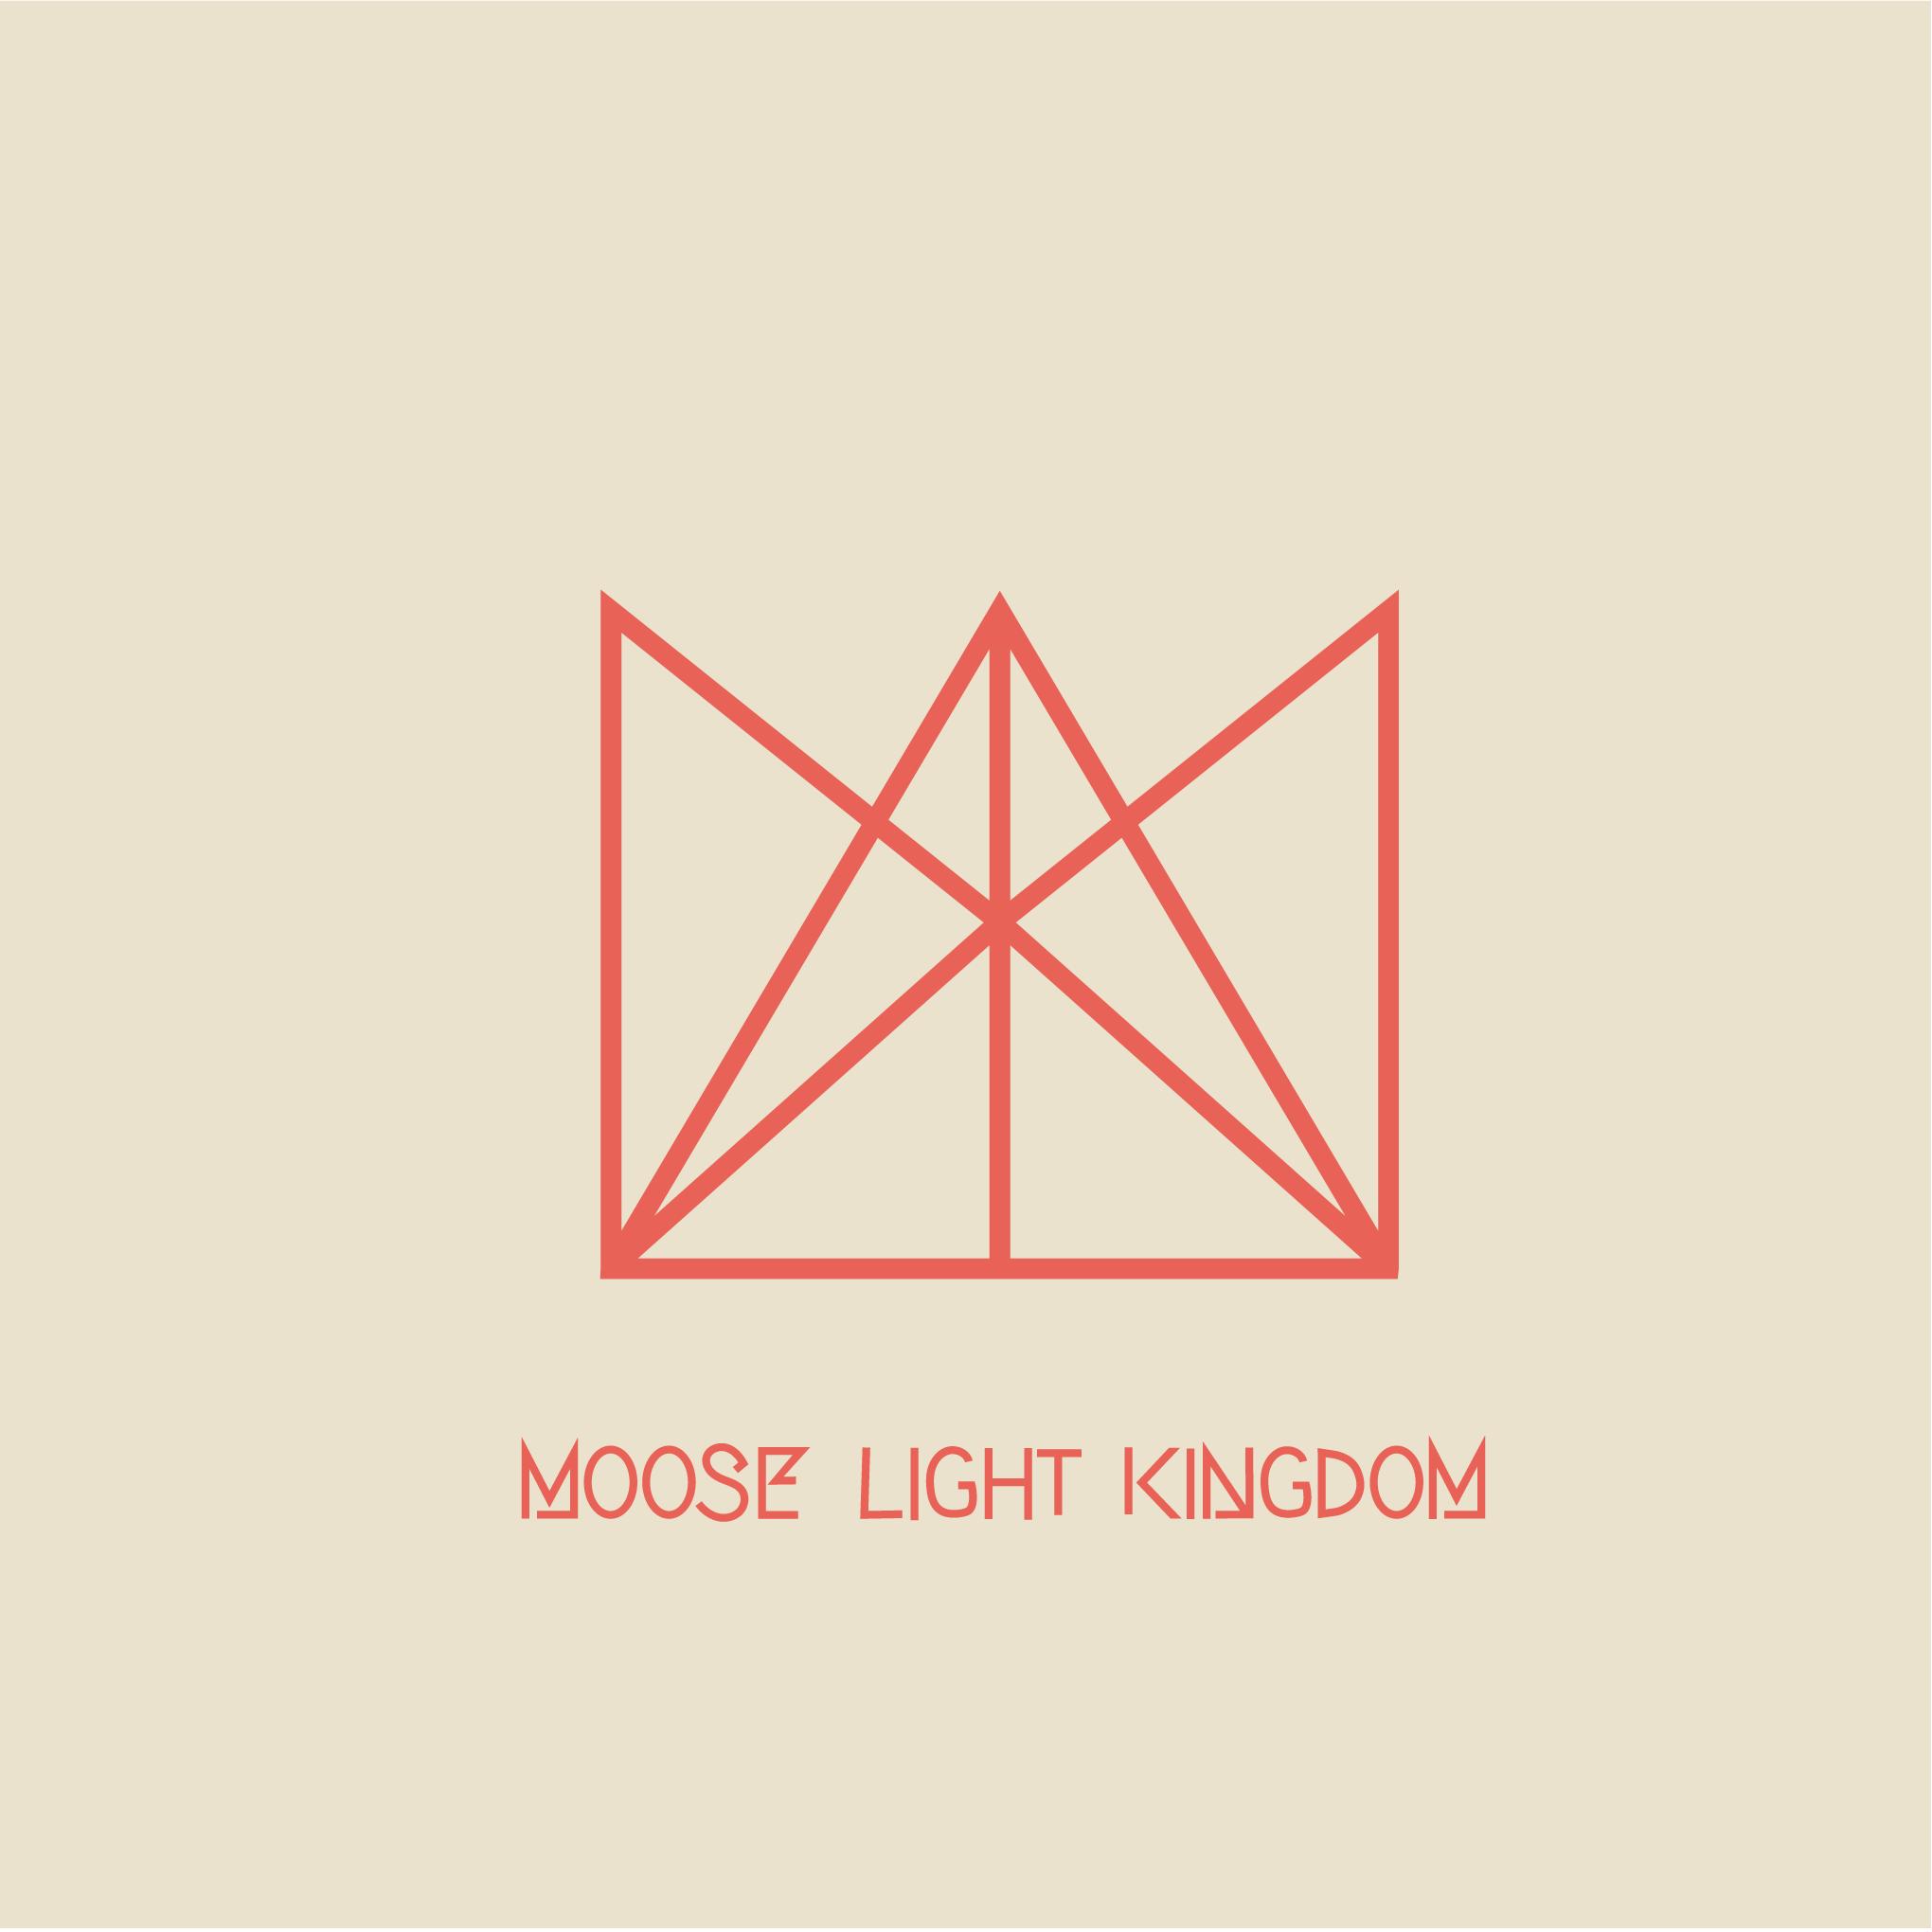 minimalist band logo